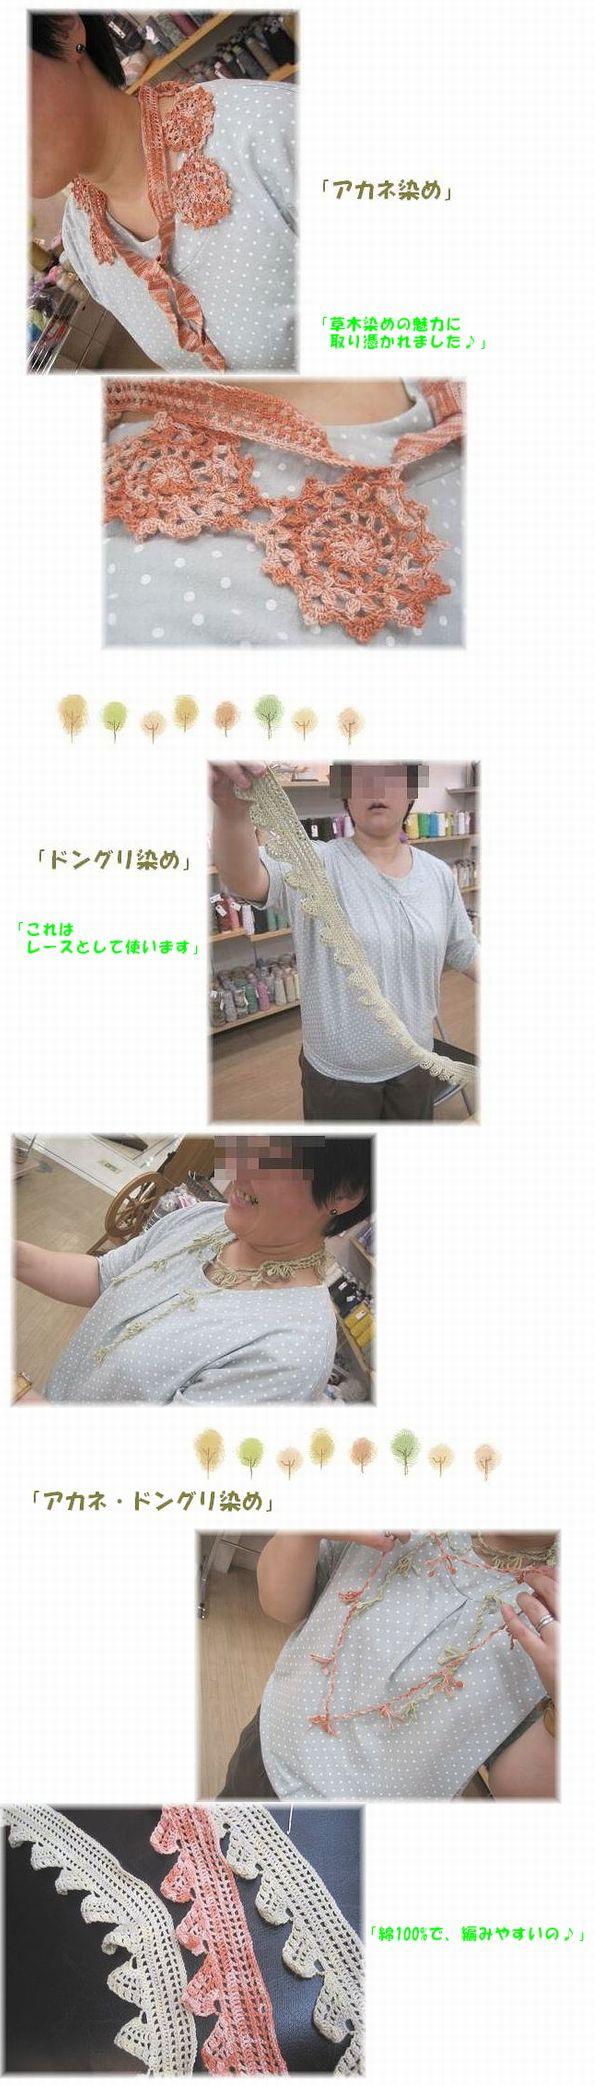 c0221884_0375941.jpg